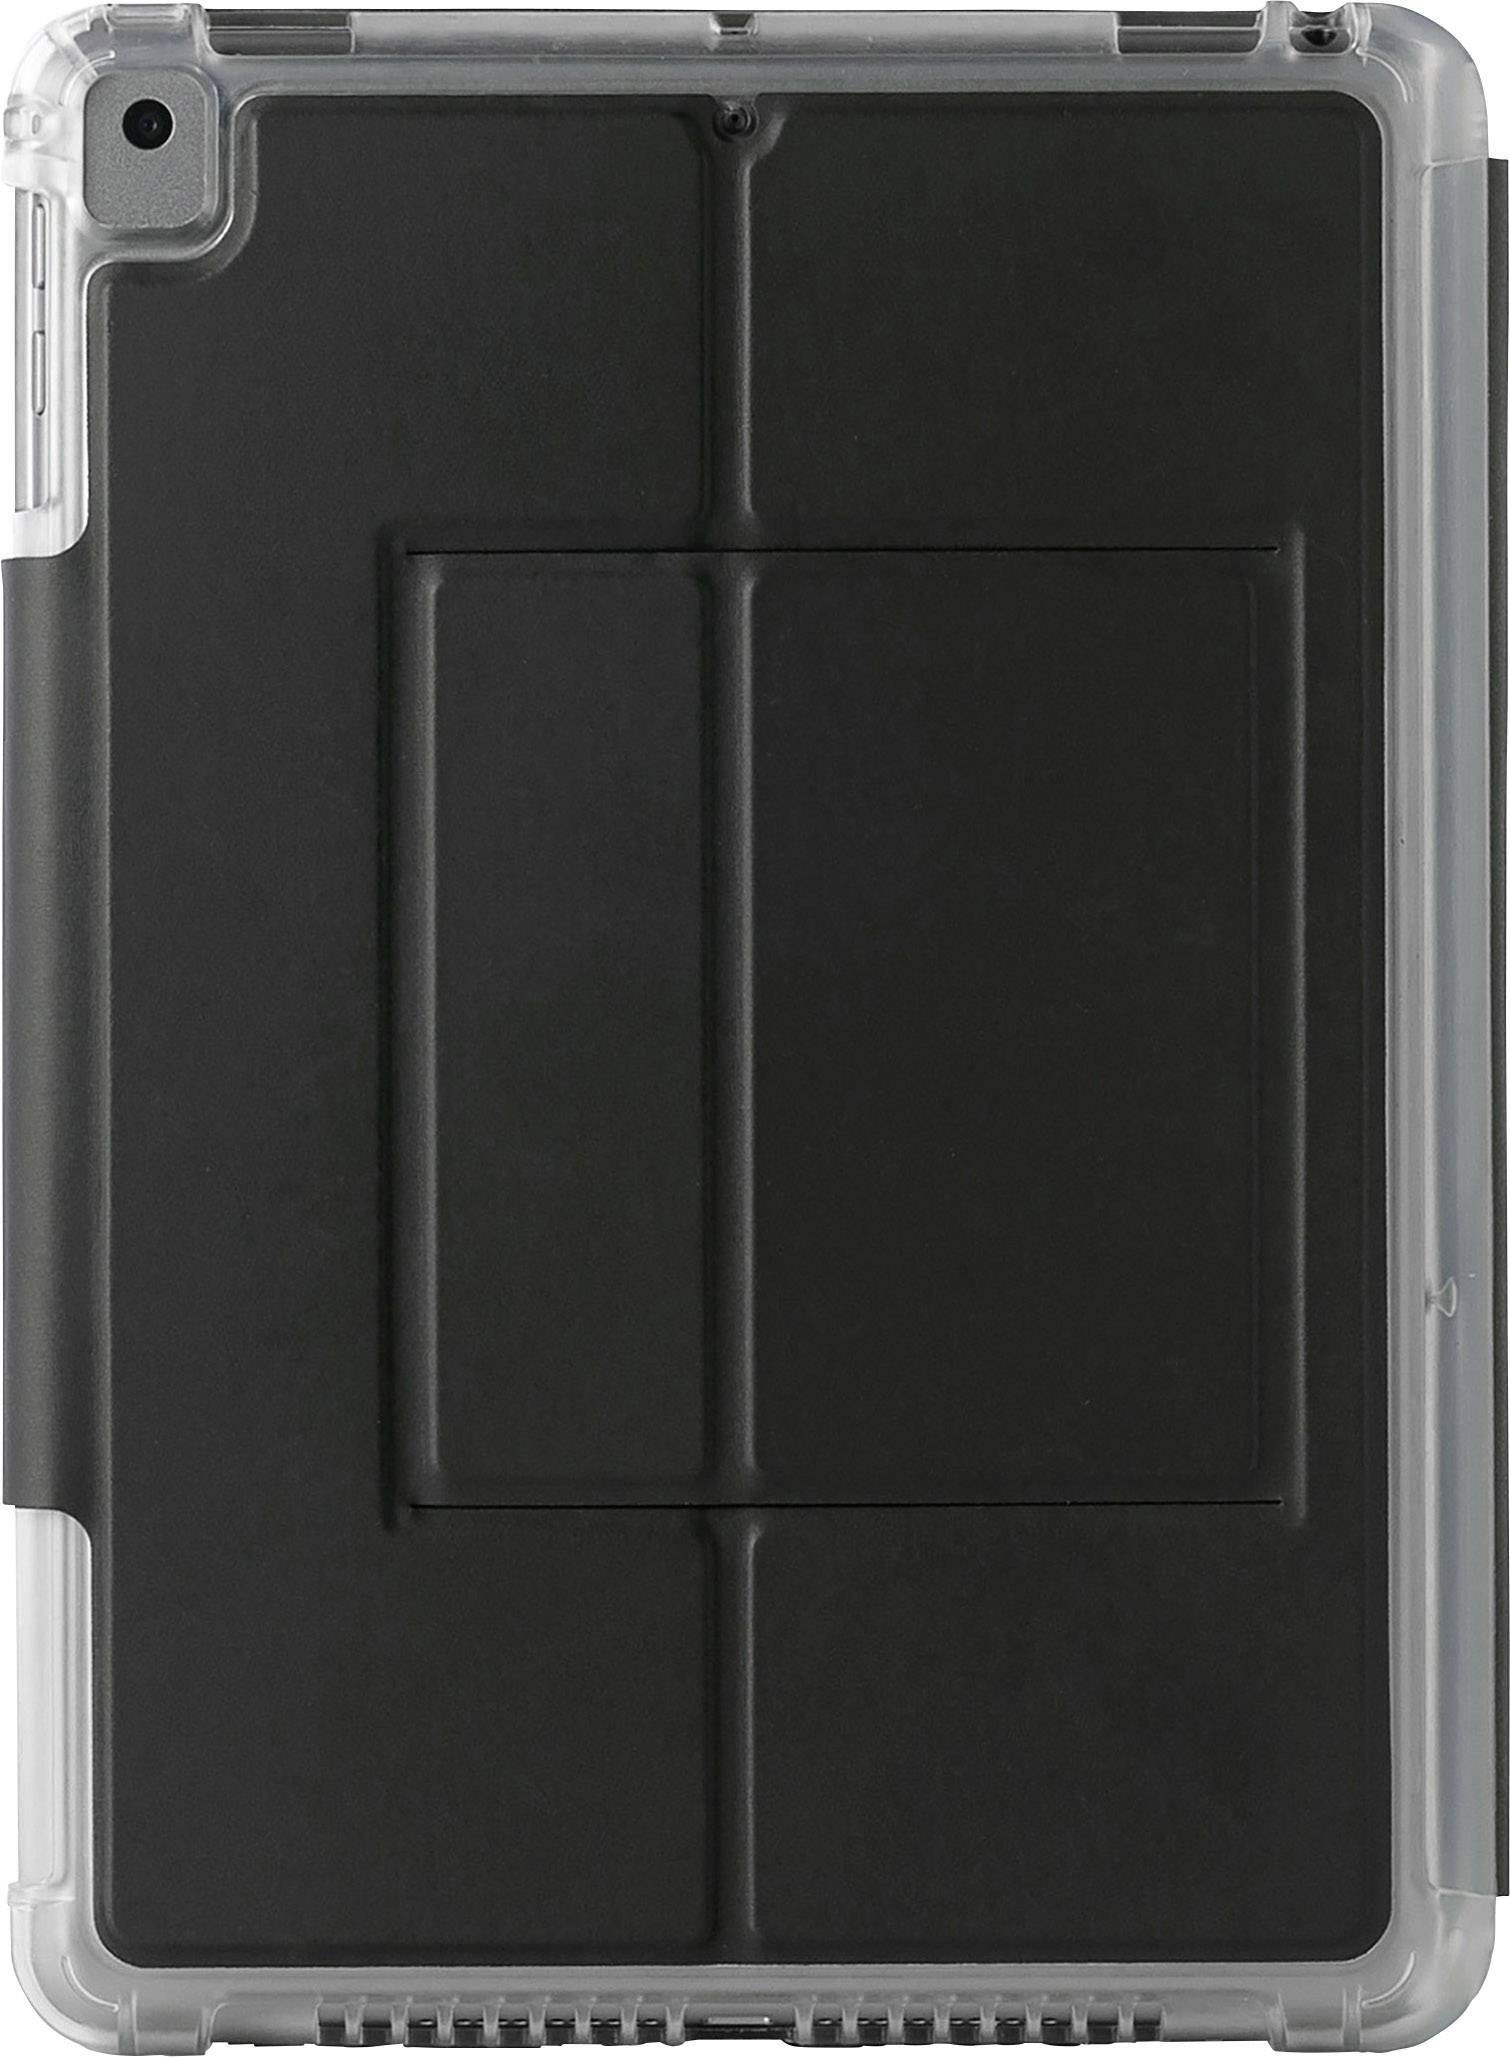 Tucano IPD9GUP DE BK Tastiera per tablet con BookCover